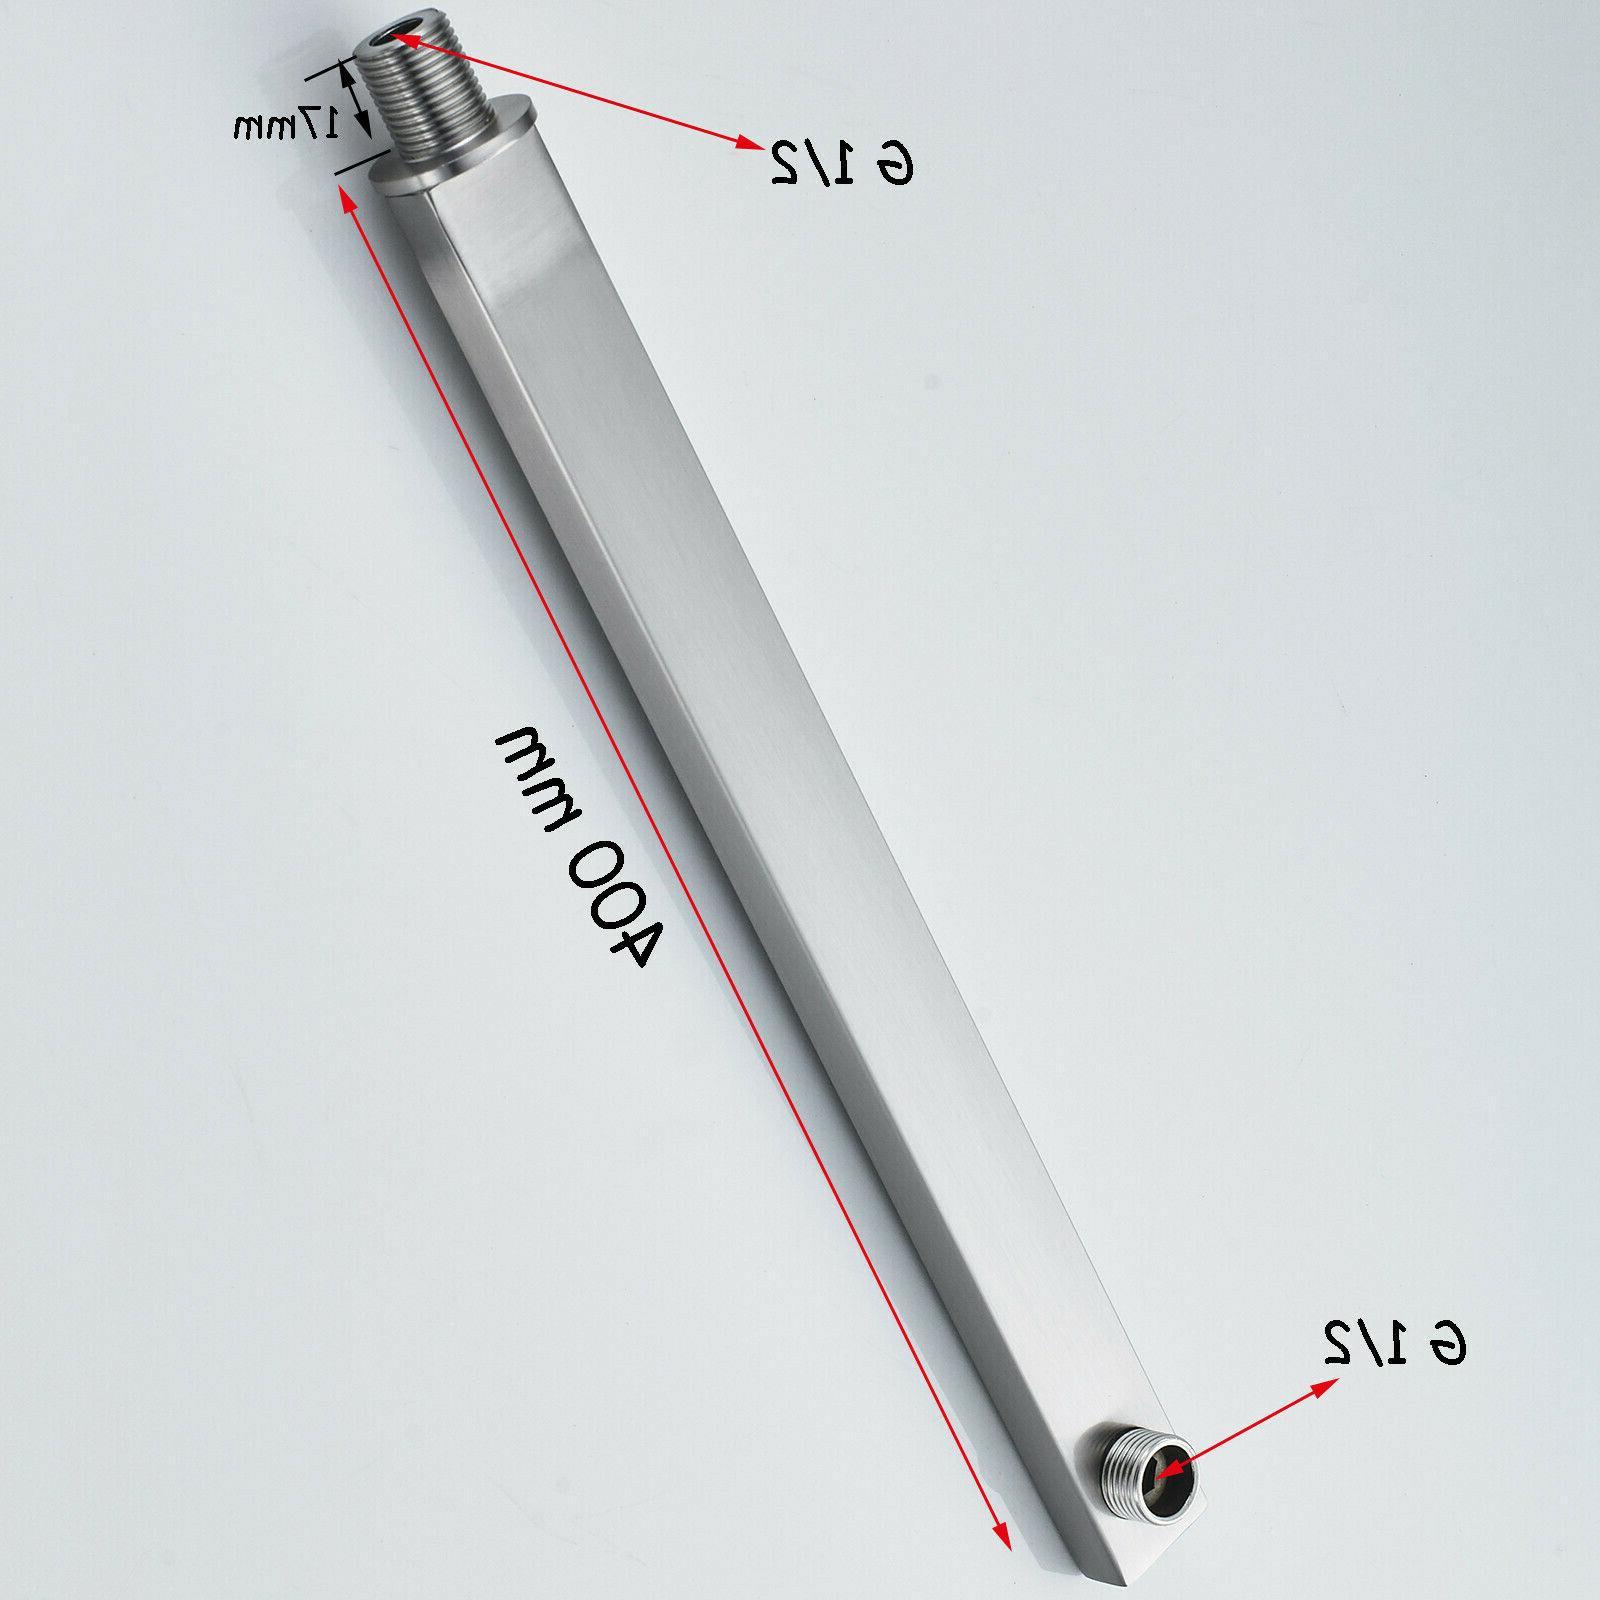 8-inch Square Shower Head Brass Arm